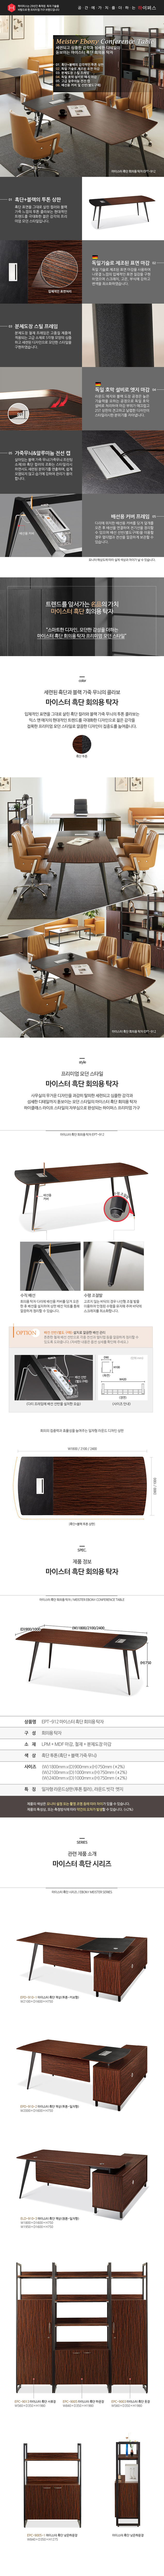 EPD-910-2 흑단 마이스터 회의용 탁자